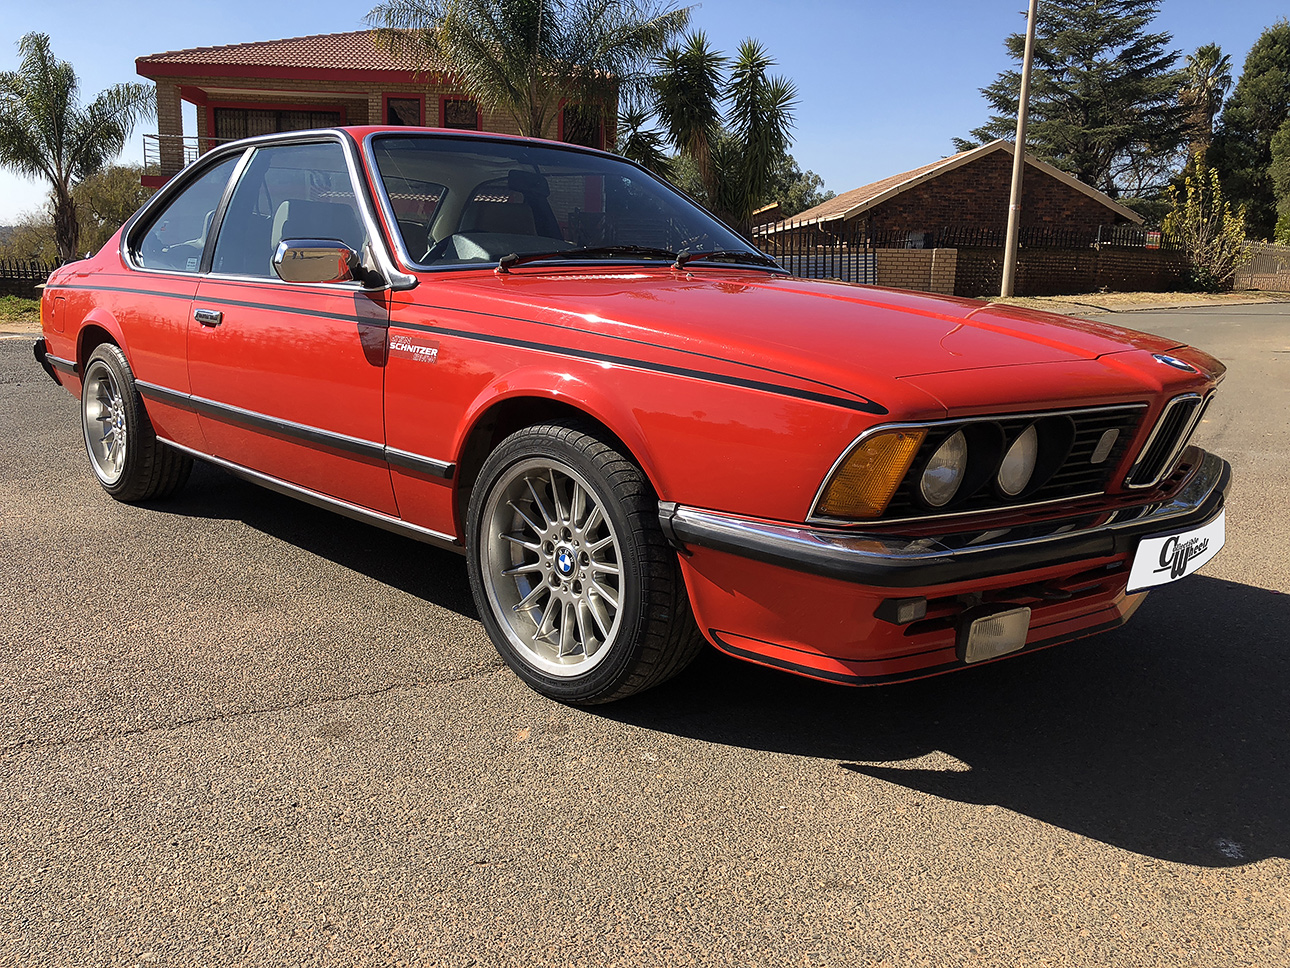 BMW E24 635CSI 1981 Model — Collectible Wheels